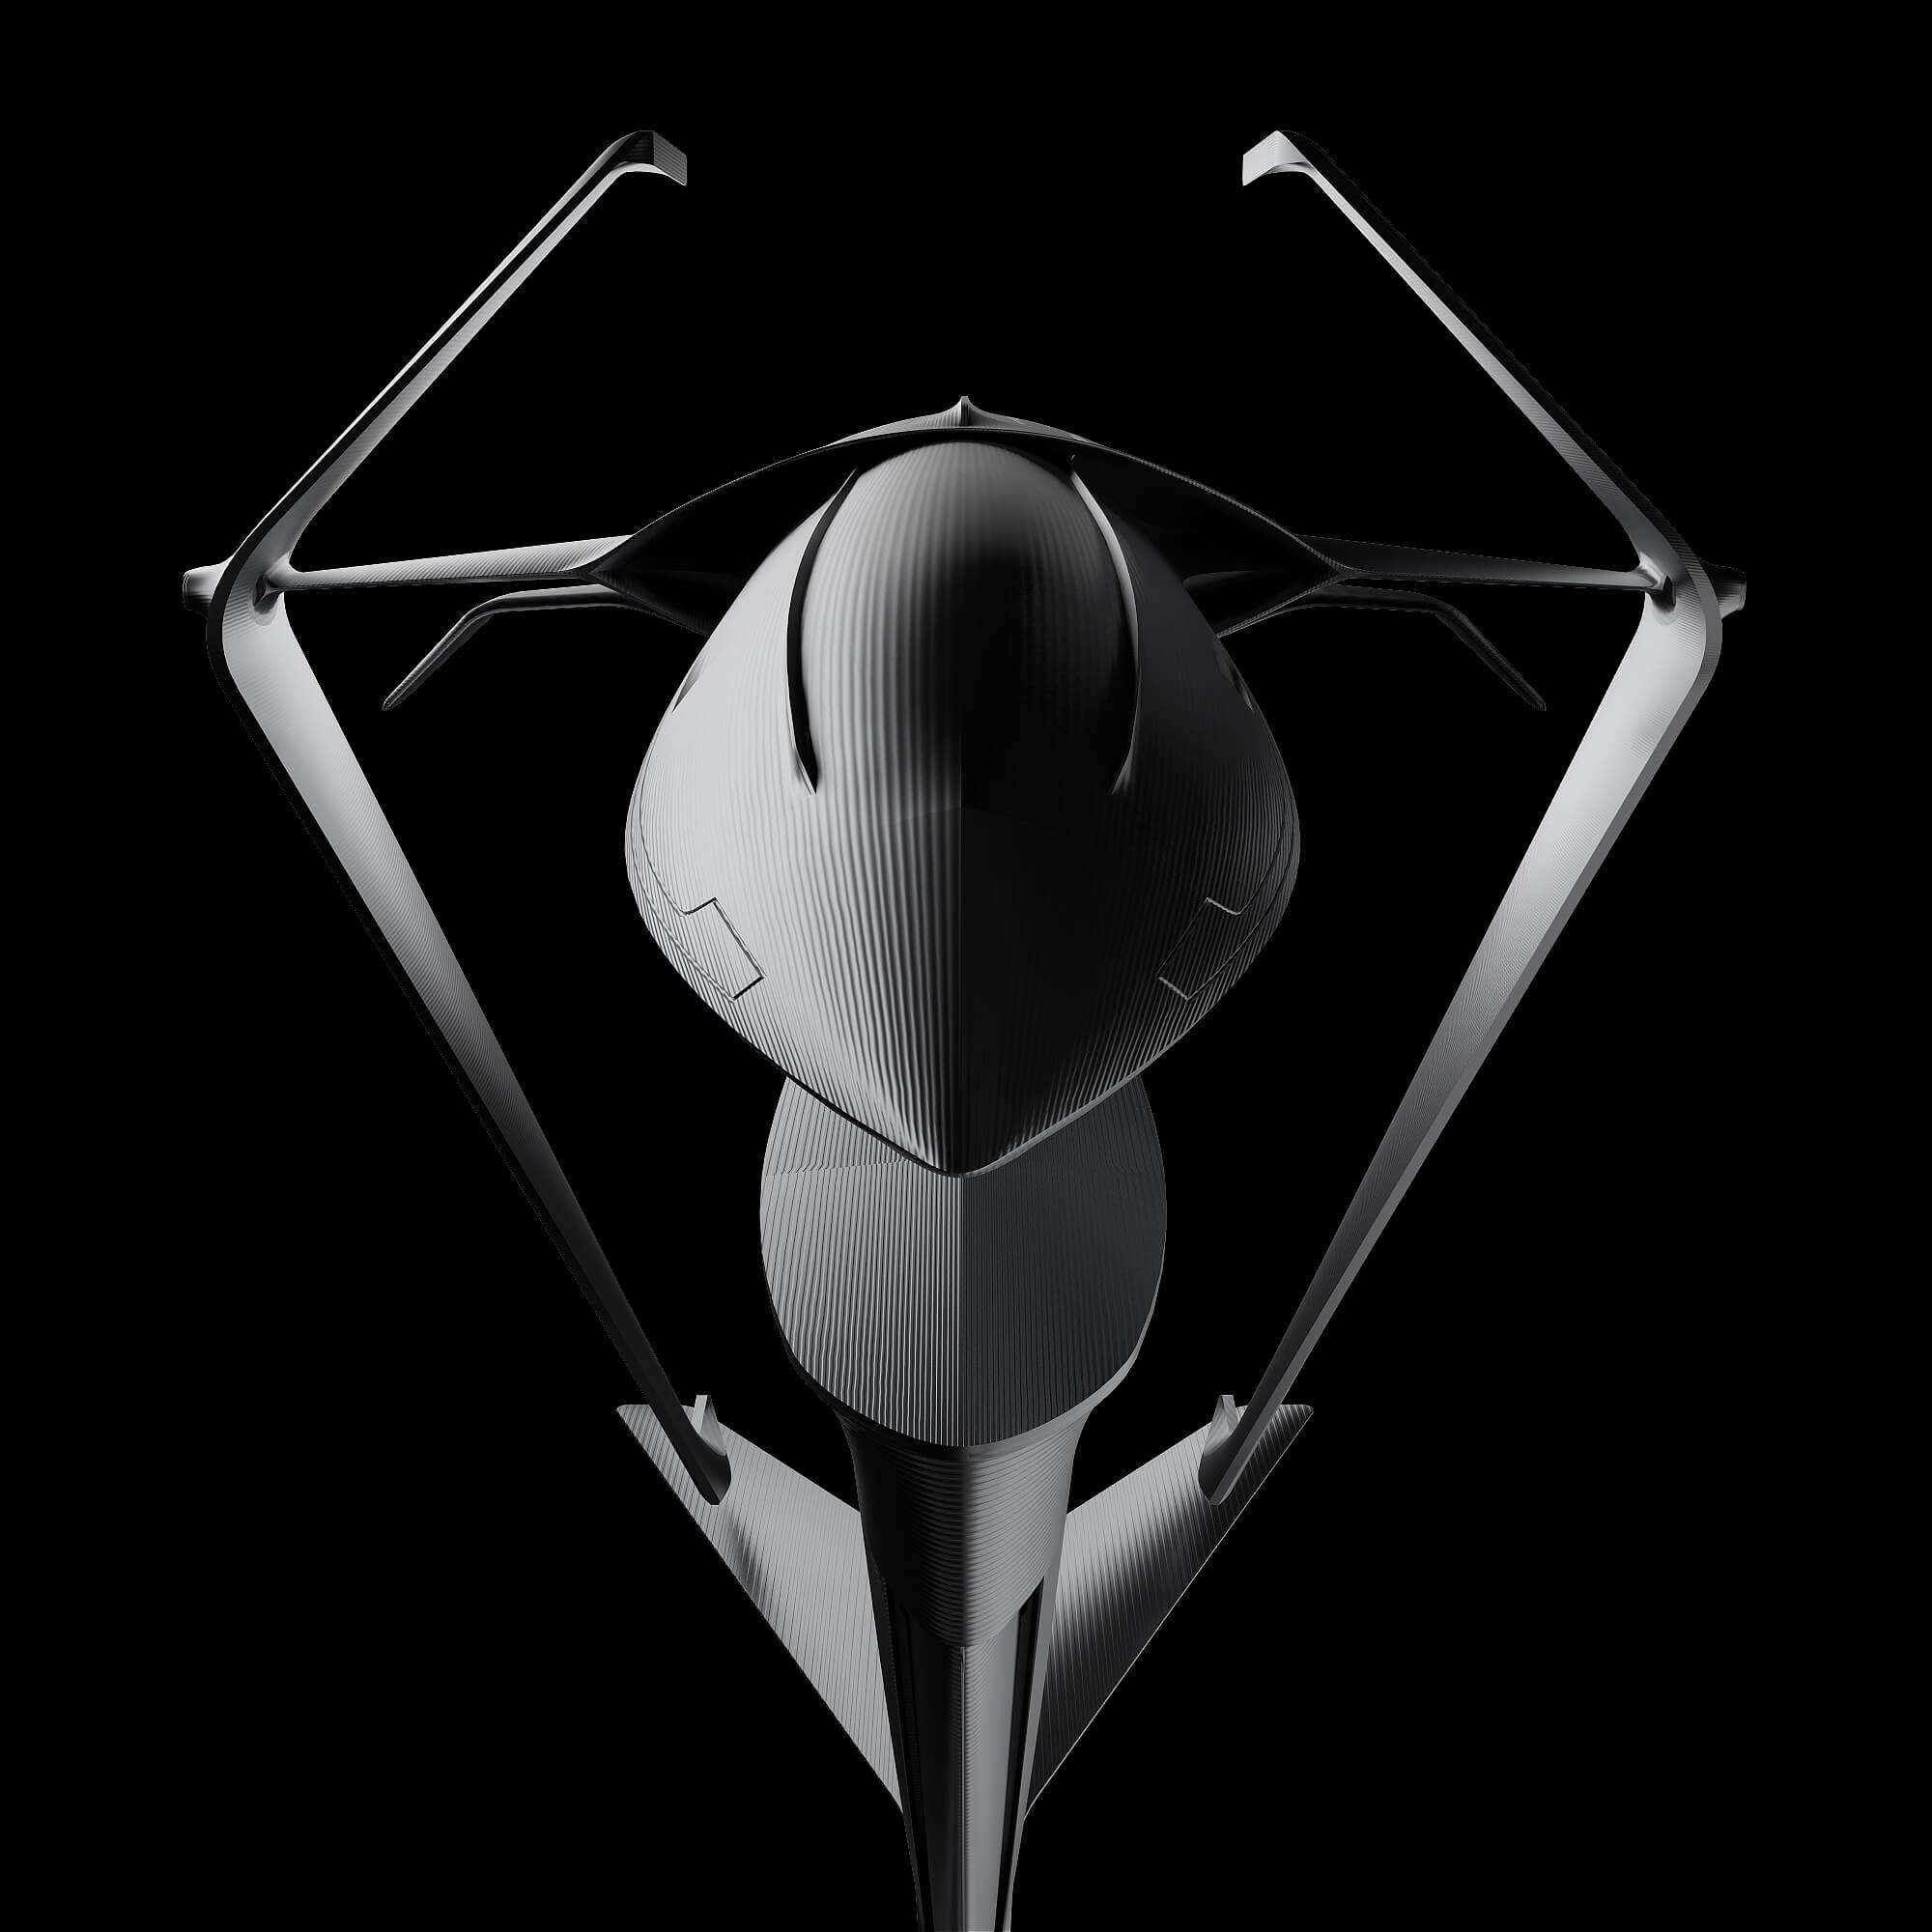 graycraft1-2 stealth black aluminium spaceship sculpture